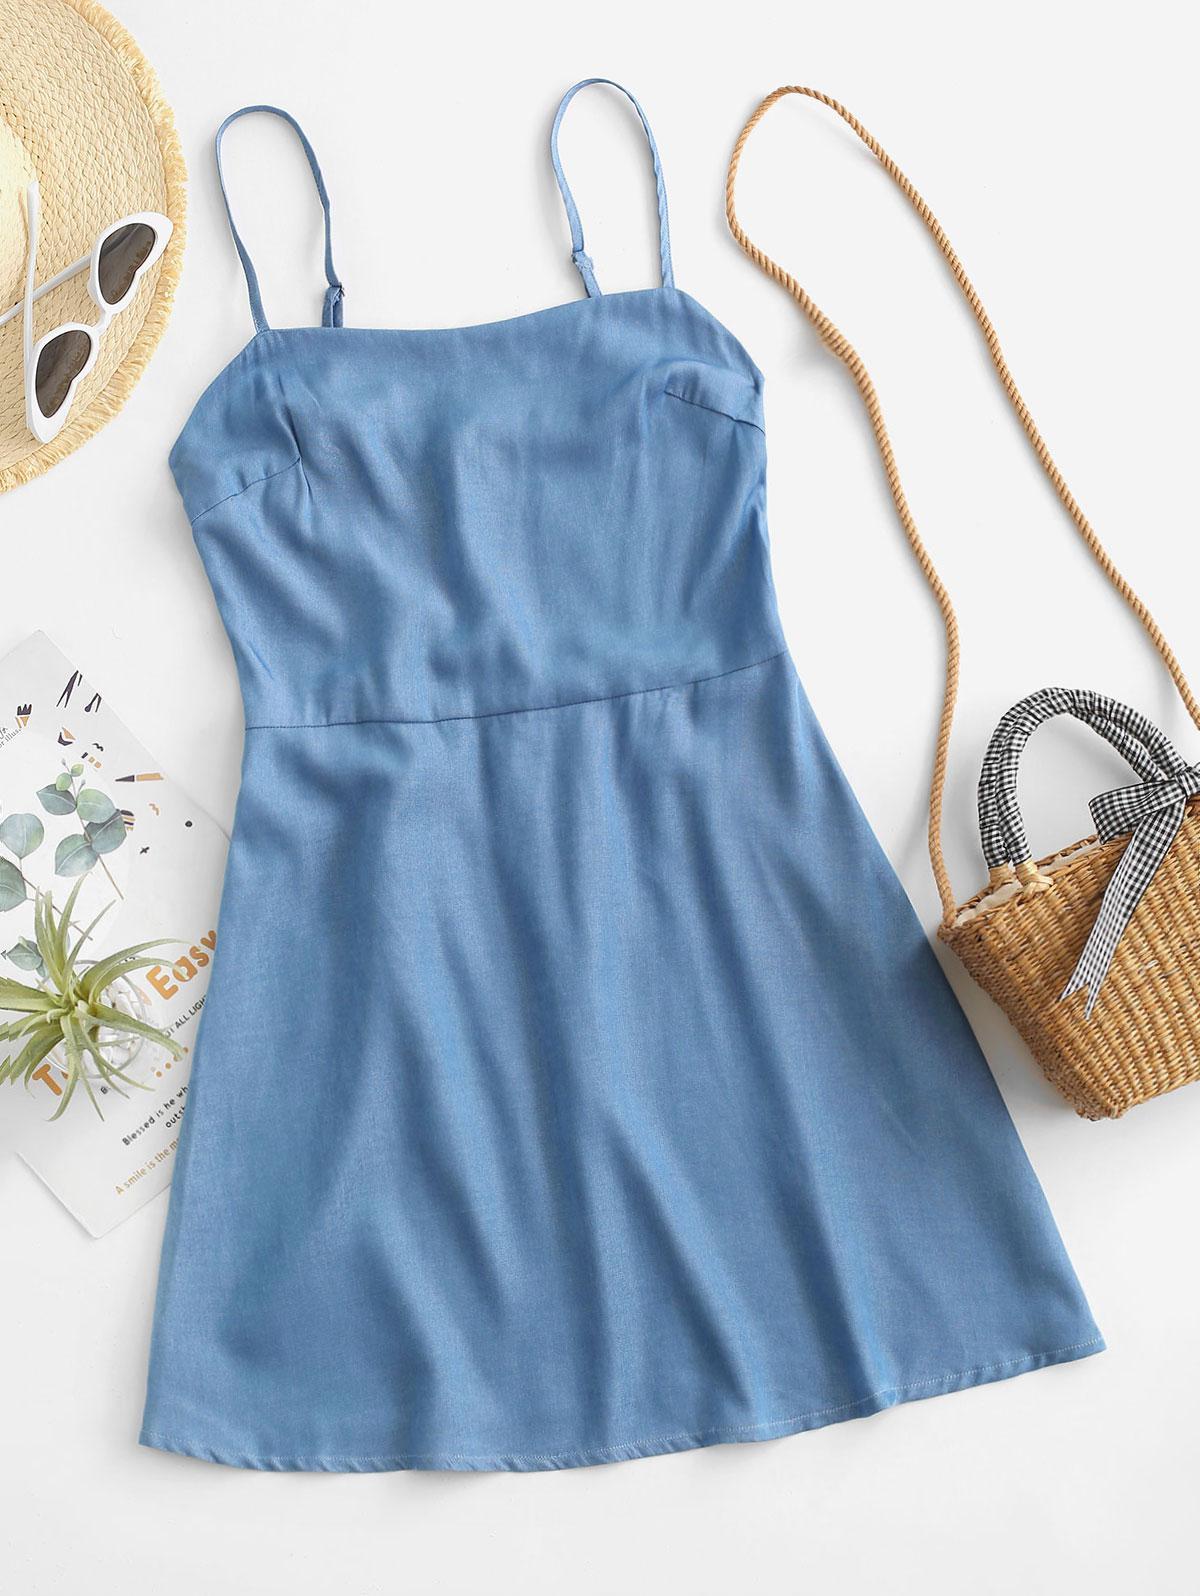 ZAFUL Chambray Smocked Back Cami Dress